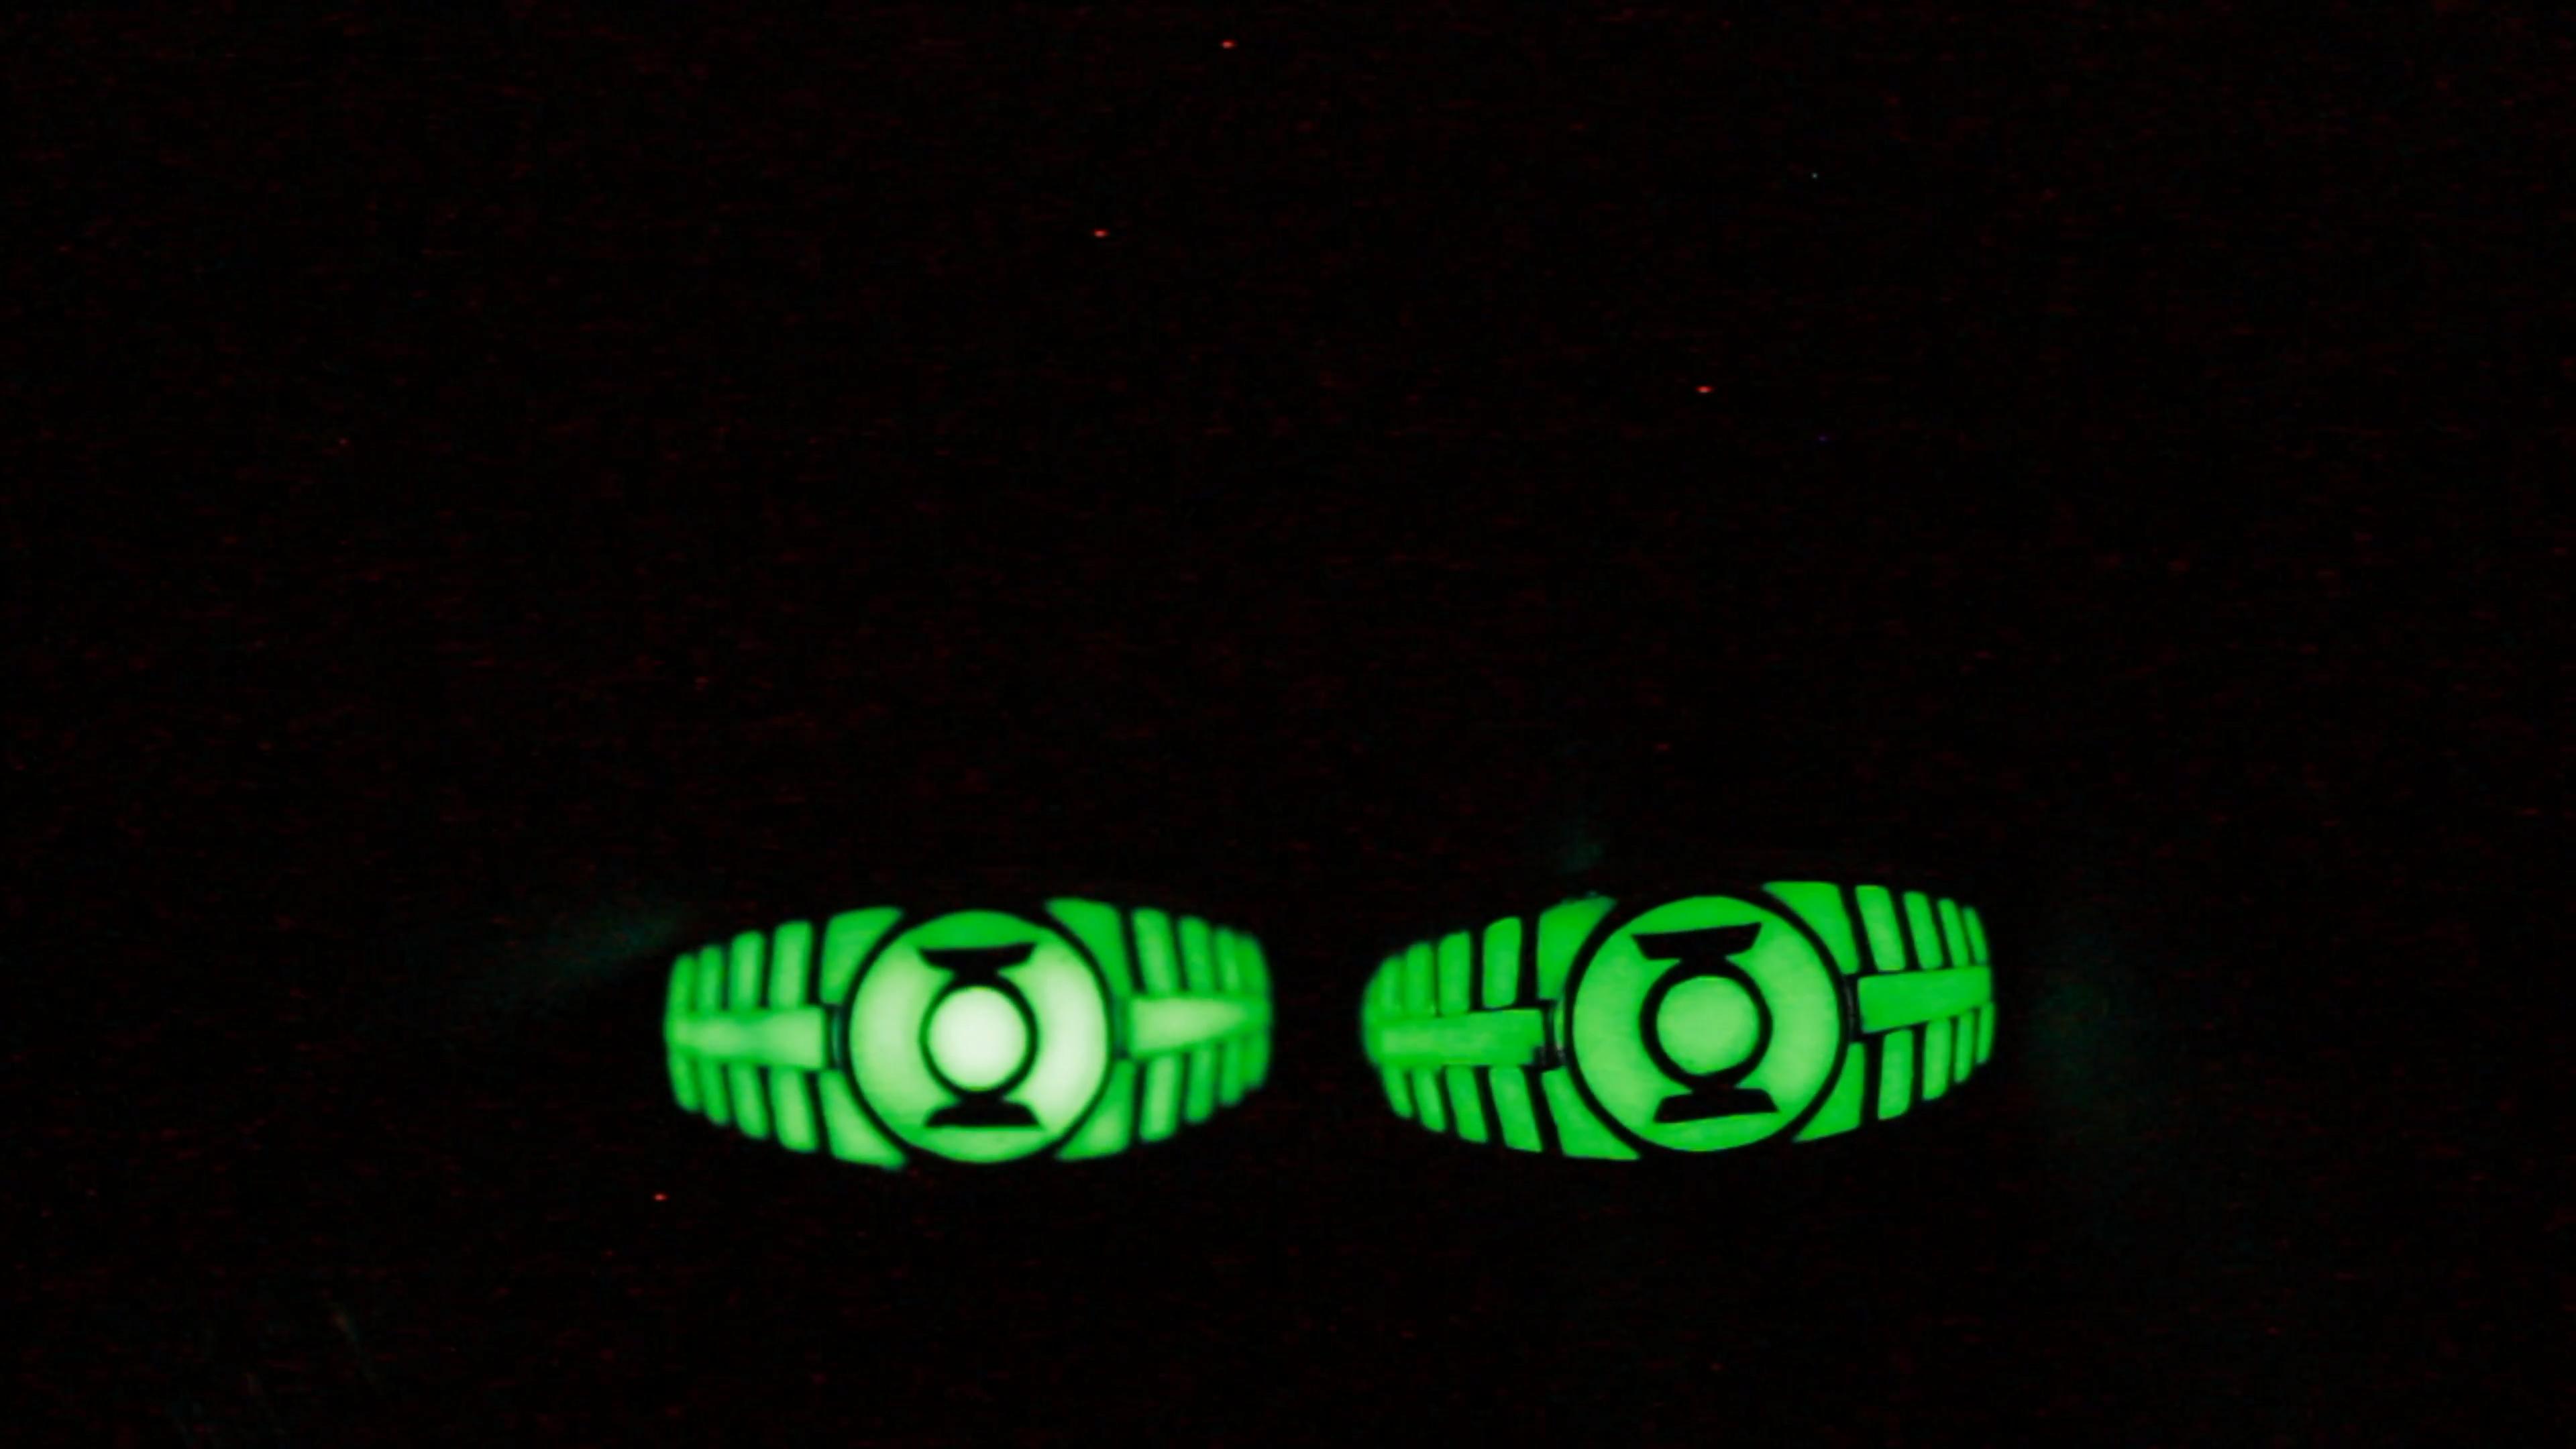 Green Lantern Glow In The Dark Ring Sterling Silver 925 Ring Video Video Green Lantern Ring White Gold Engagement Rings Vintage Lantern Rings